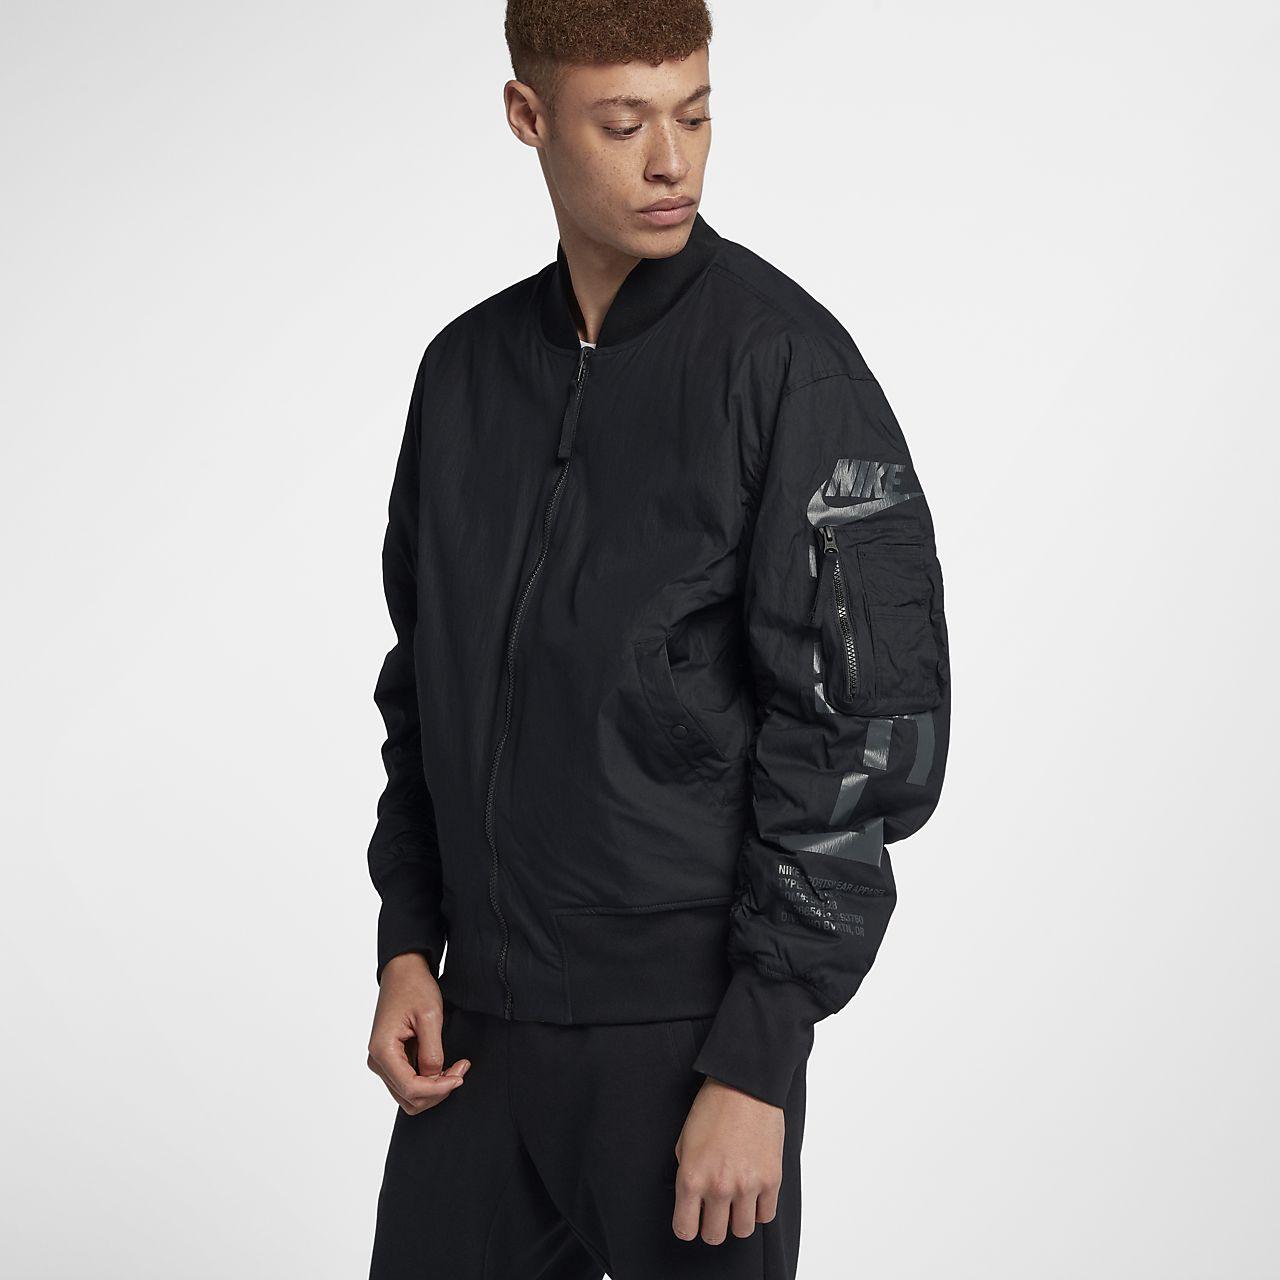 Nike Sportswear AF1 Men Reversible Jacket